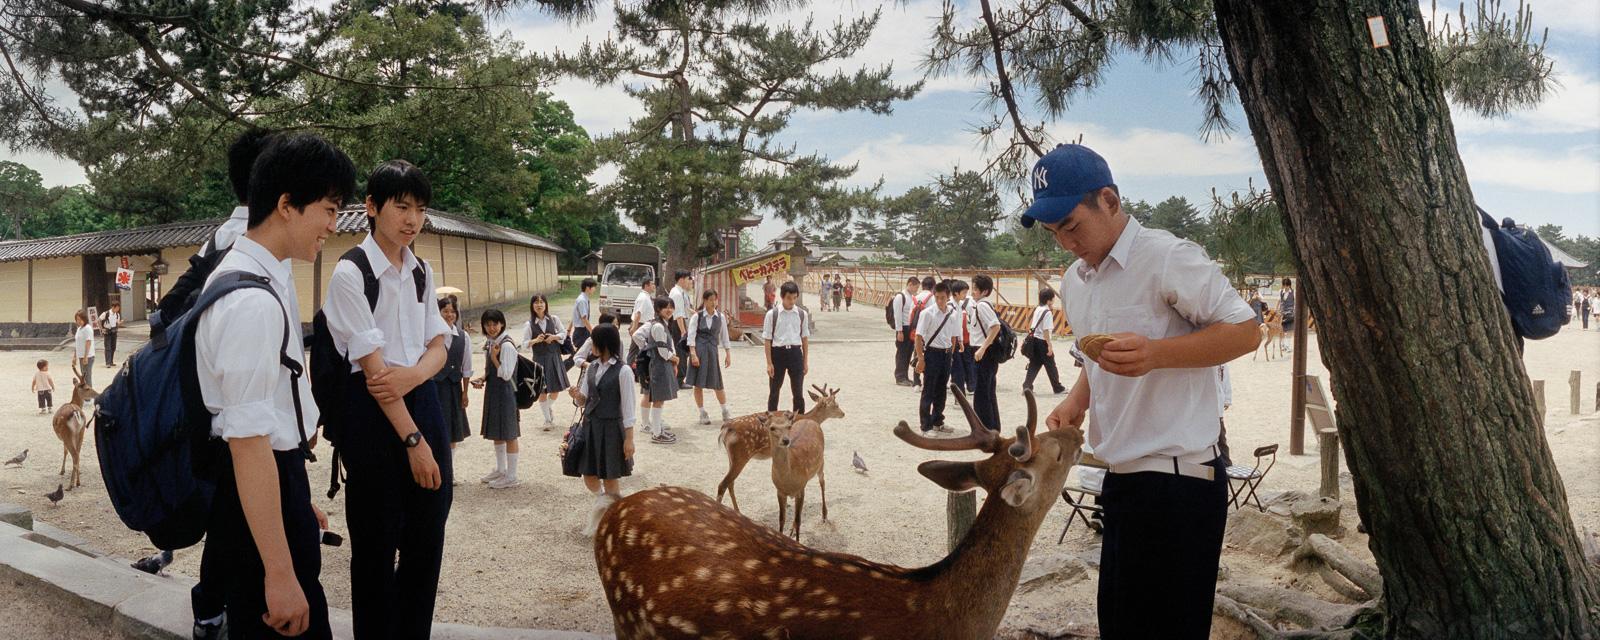 12-nara-boys-feeding-deer.jpg